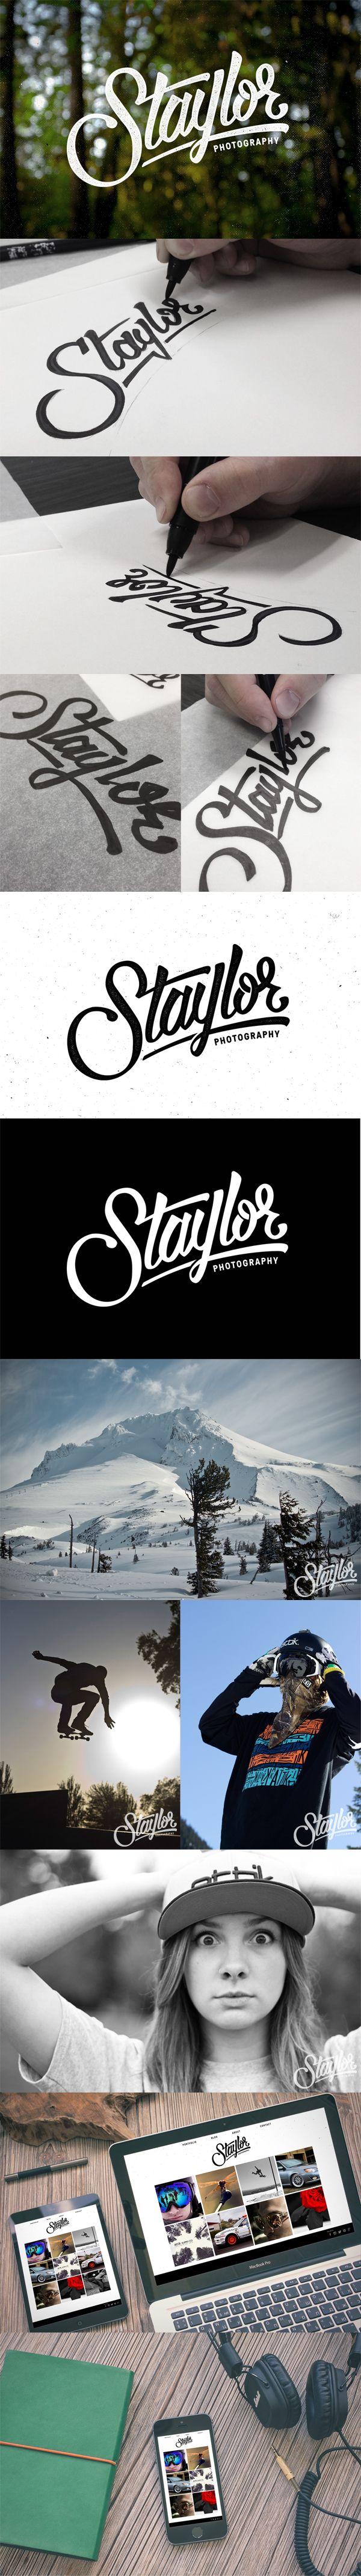 Staylor Photography by Brian Jagodnik, via Behance